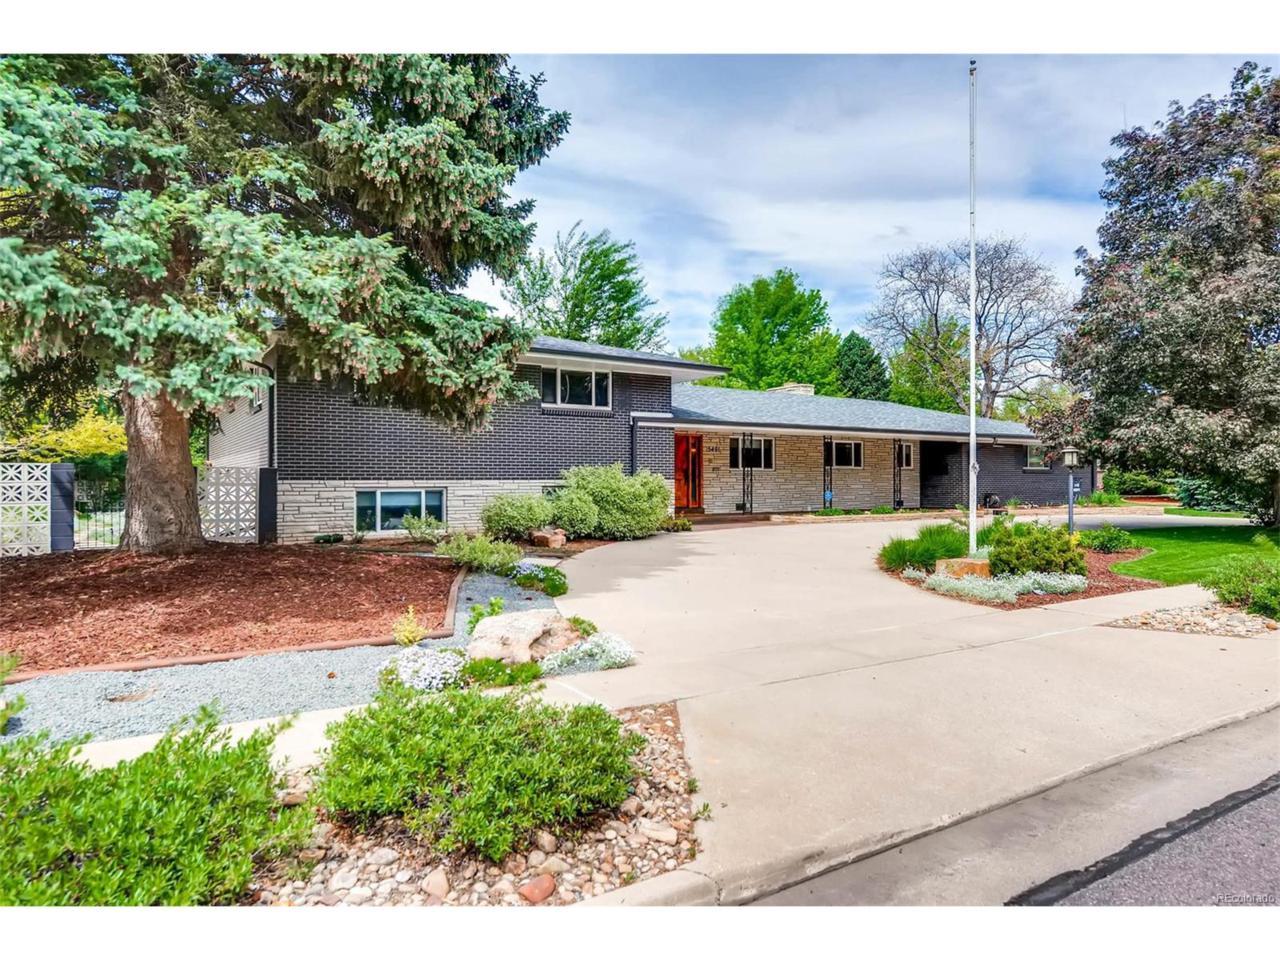 5401 W Lakeridge Road, Lakewood, CO 80227 (MLS #8601799) :: 8z Real Estate